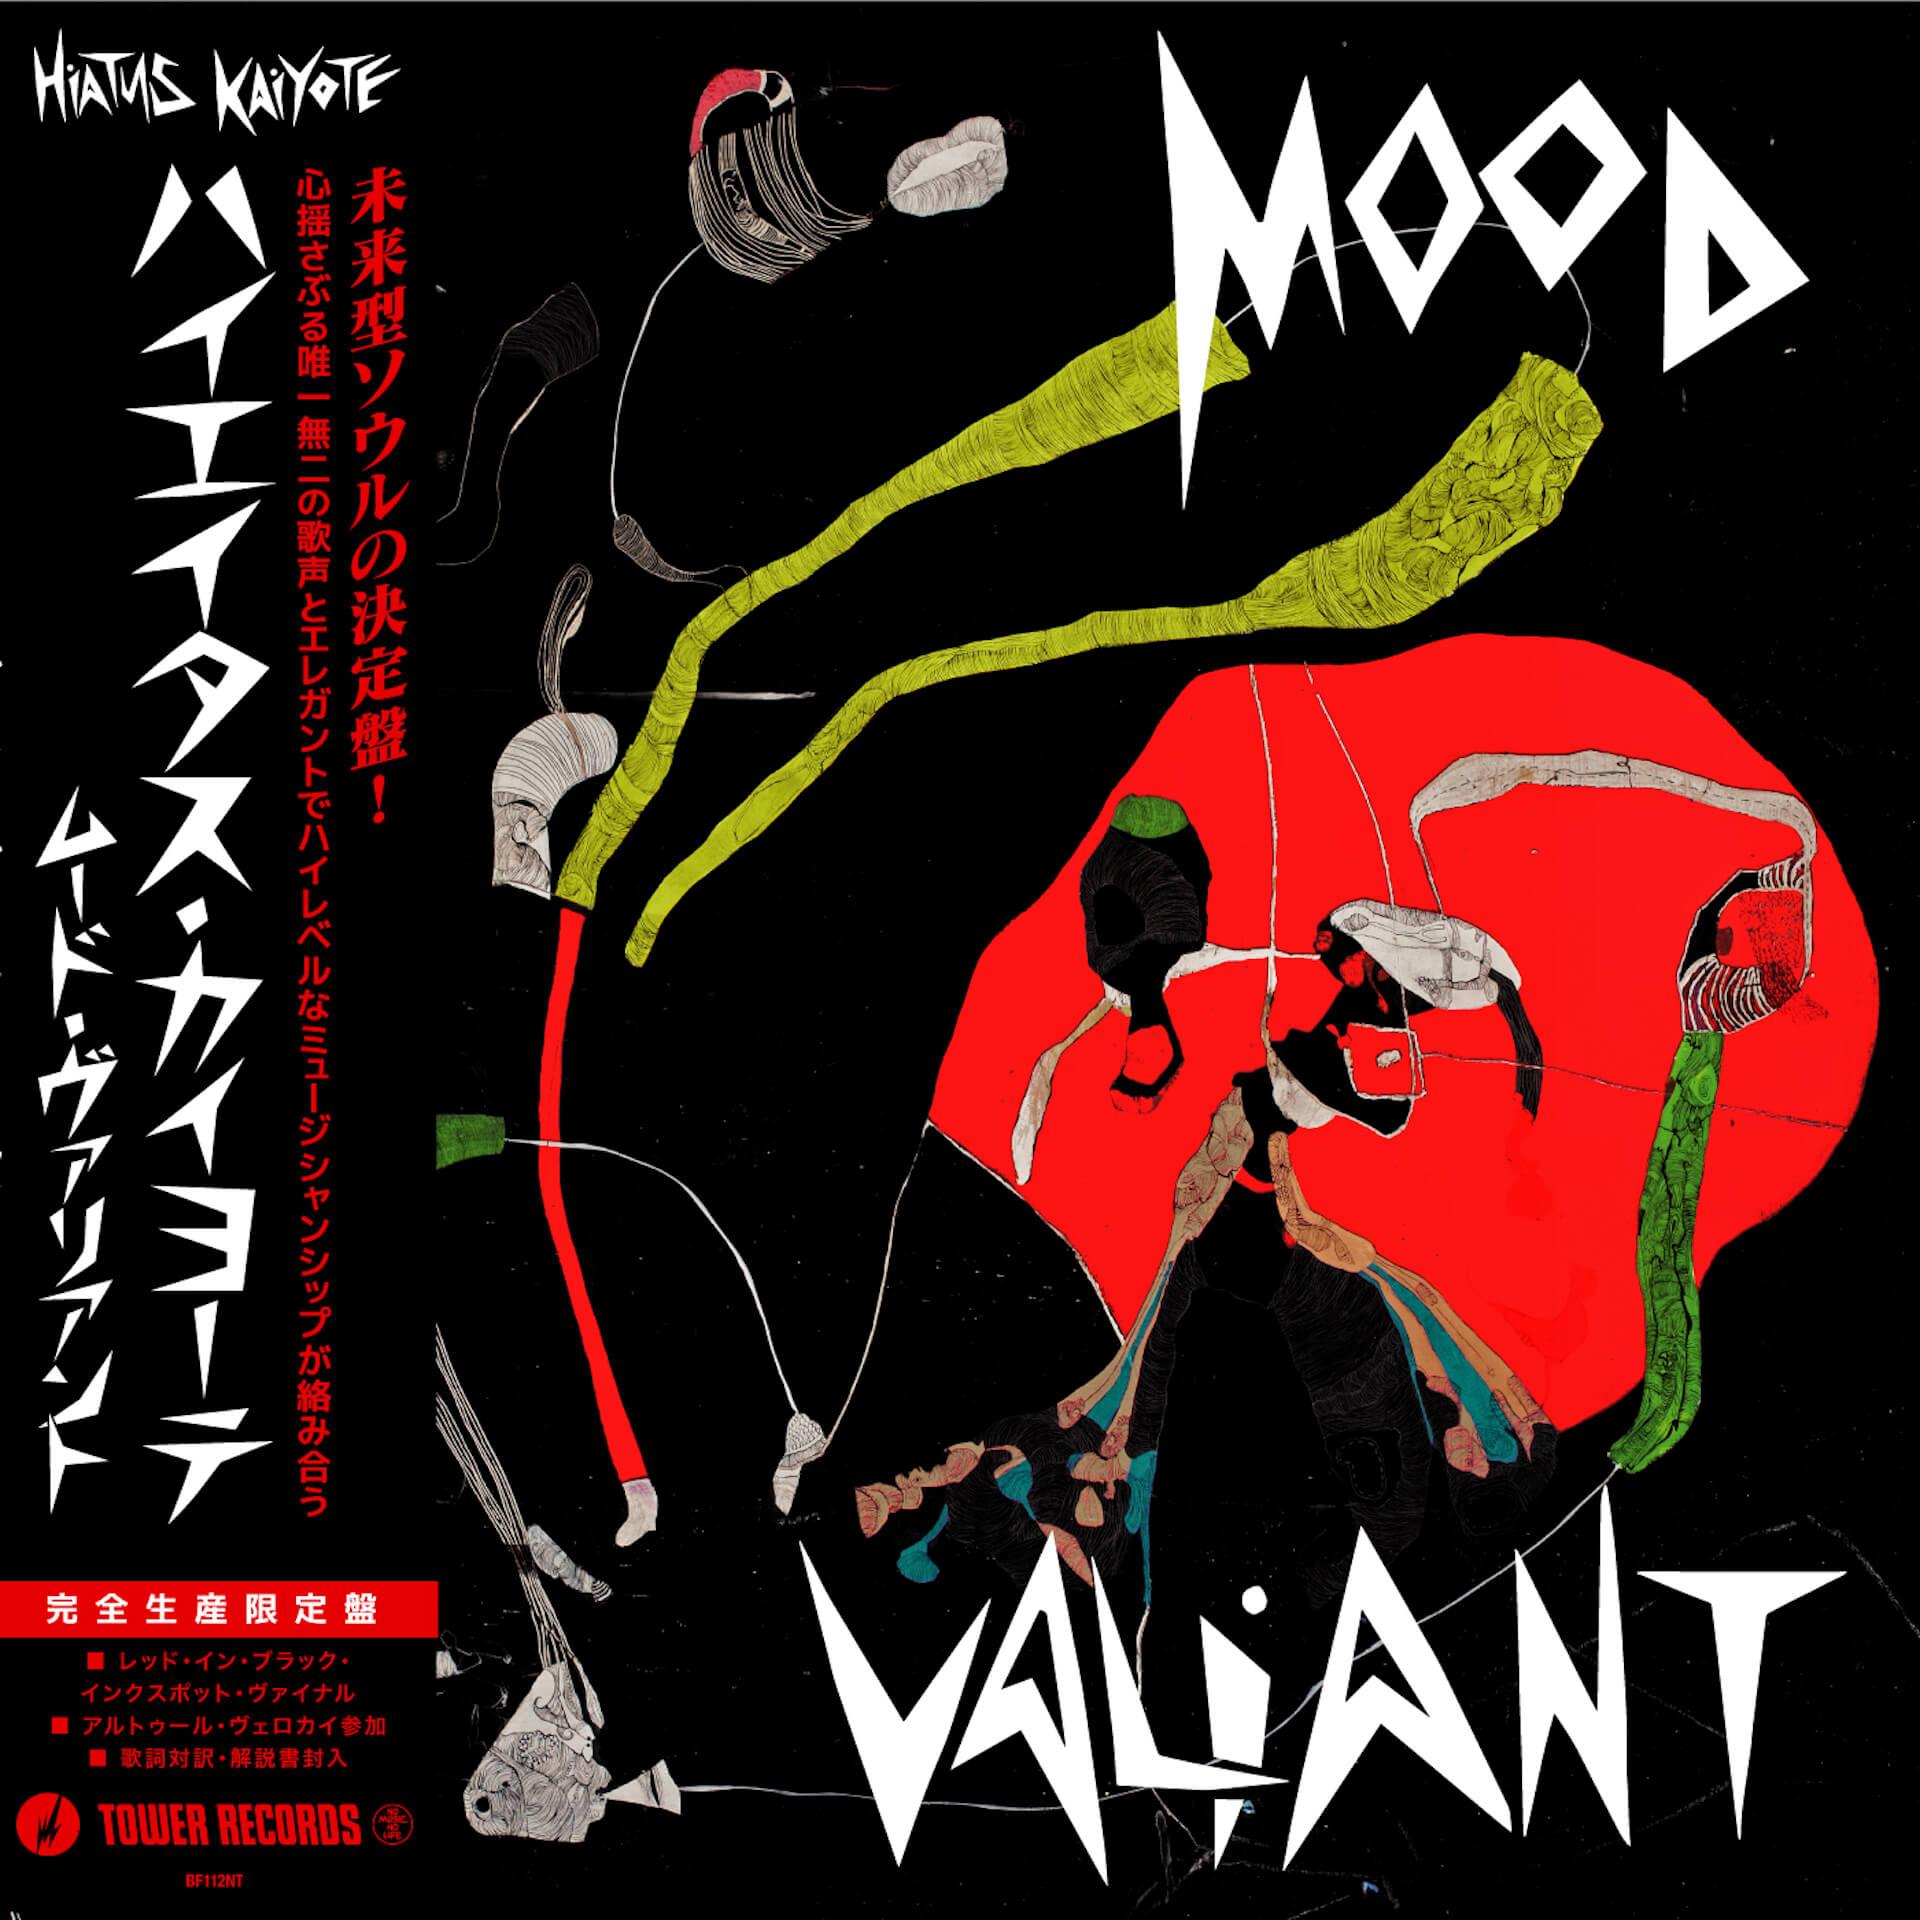 "Hiatus Kaiyote最新作『Mood Valiant』の先行配信曲""Get Sun(feat. Arthur Verocai)""のMVが公開! music210623_hiatuskaiyote_11"